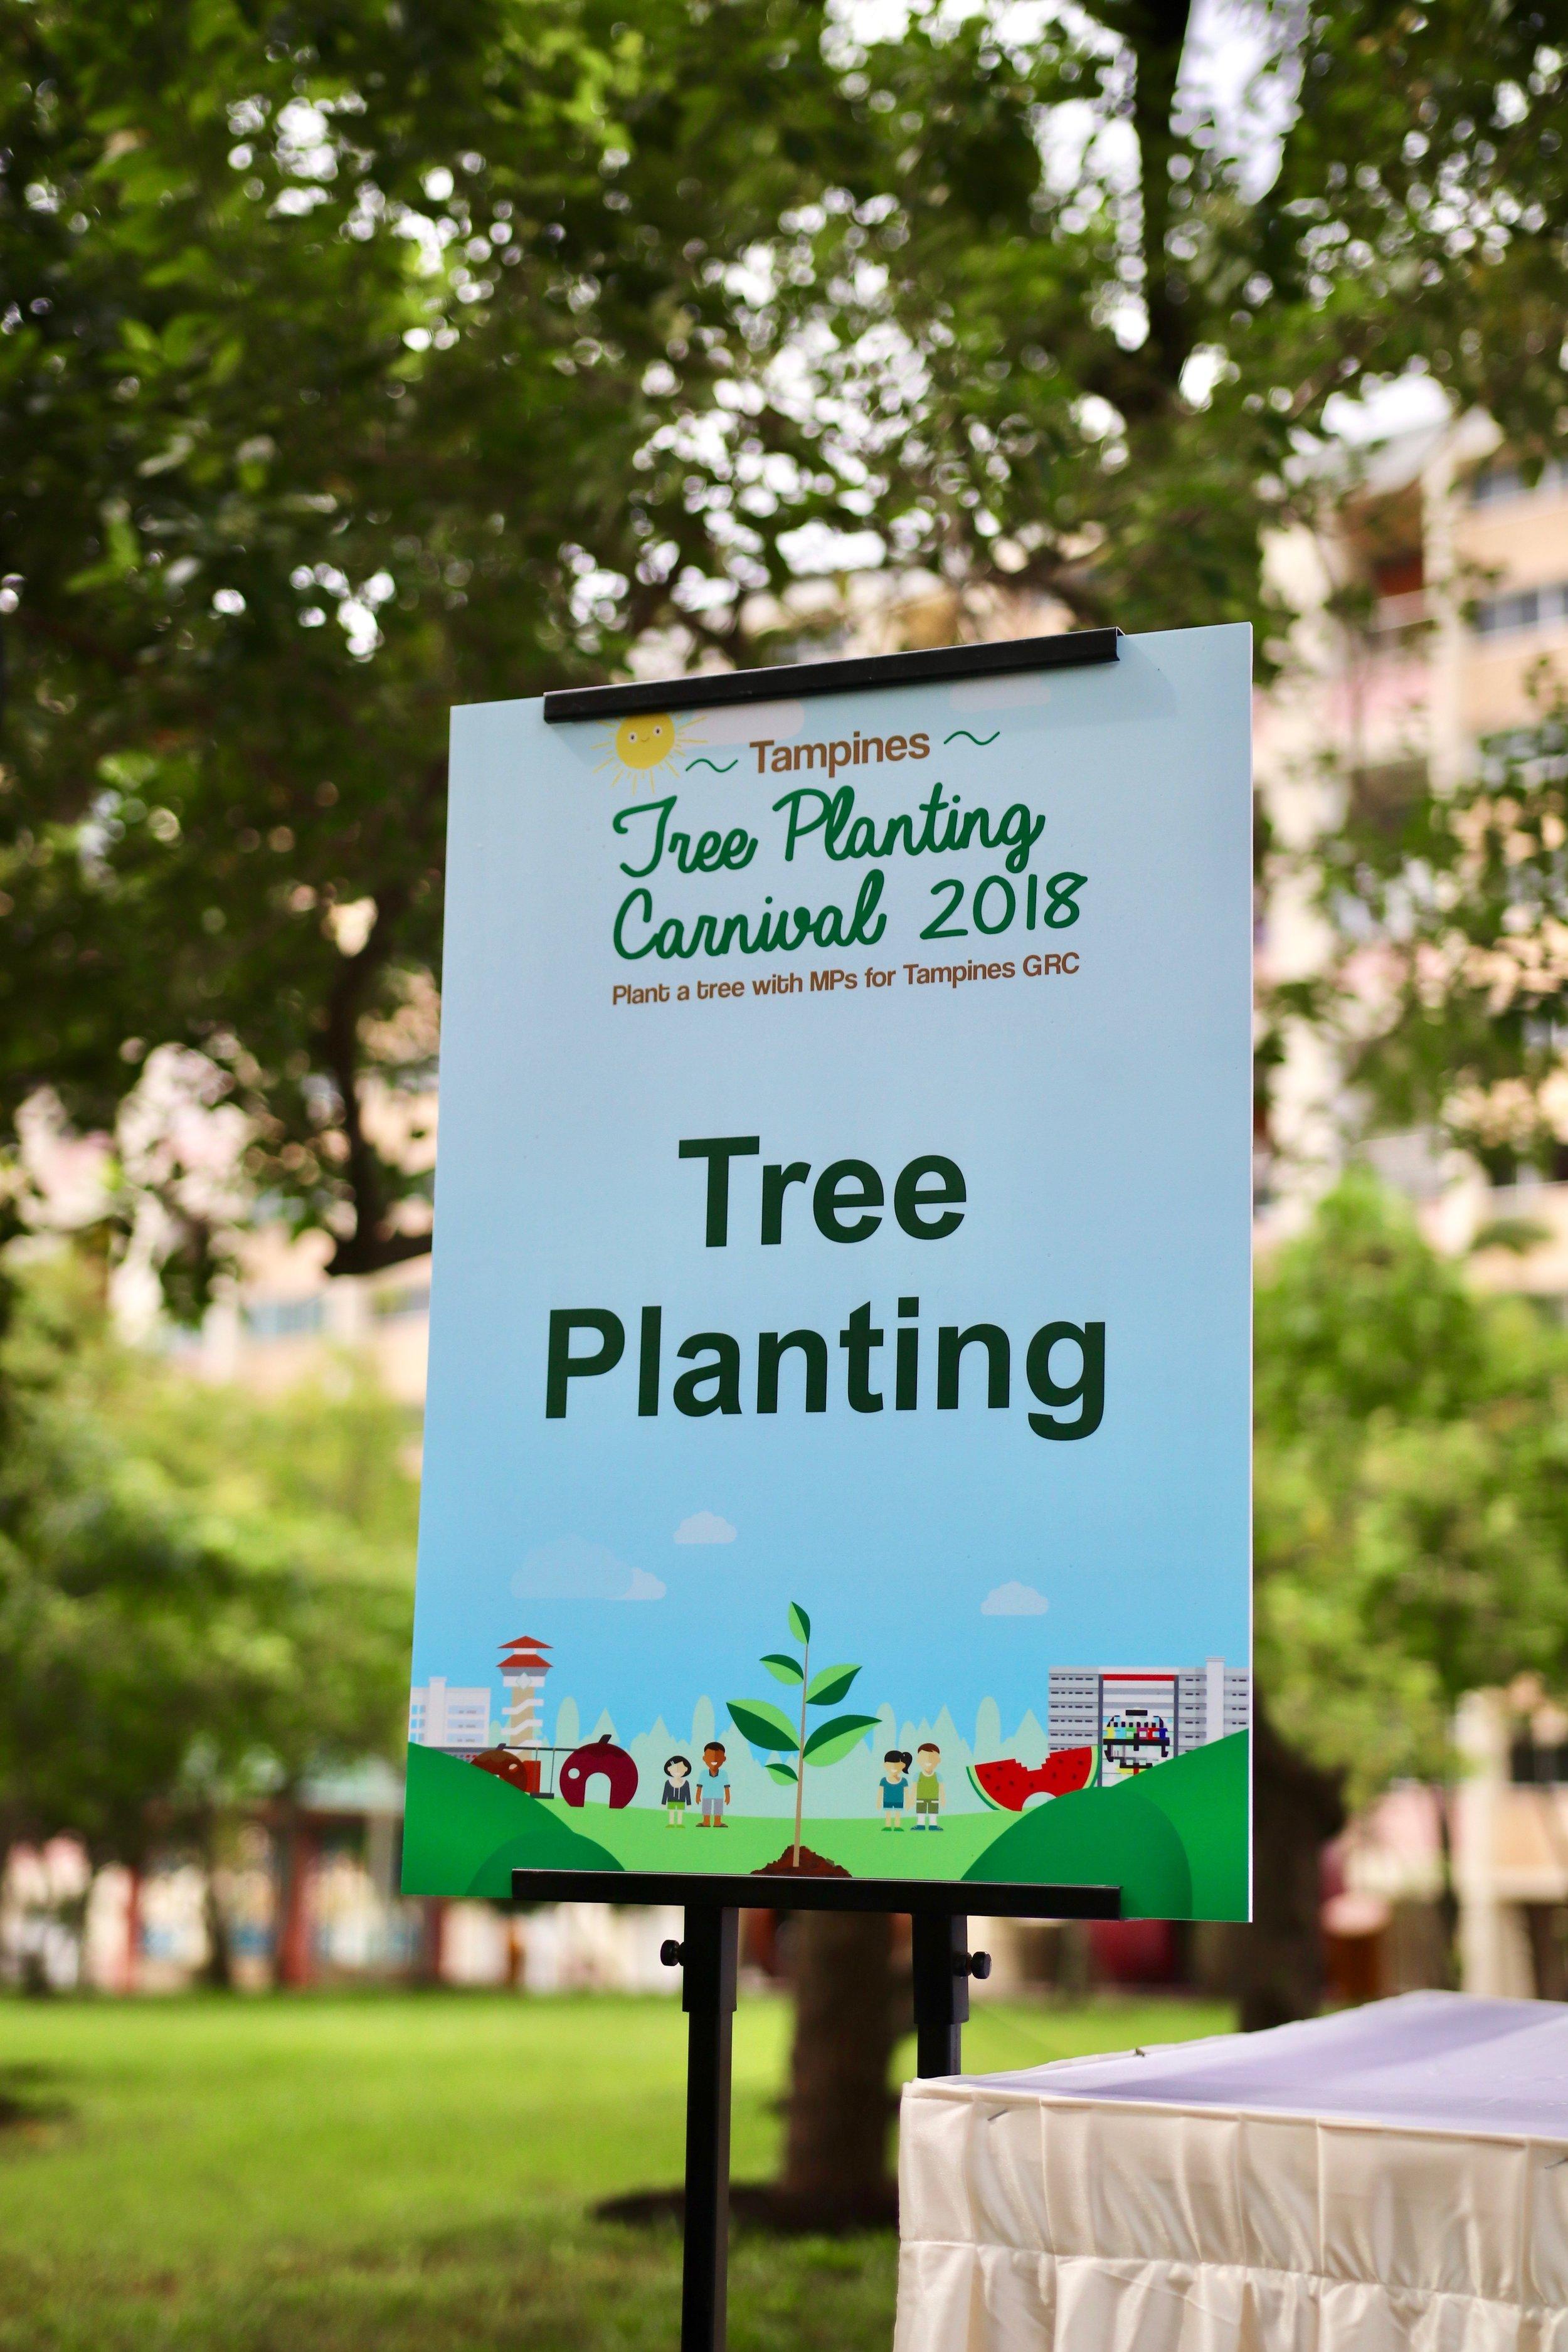 Tree Planting 2018 - 1 of 160.jpg